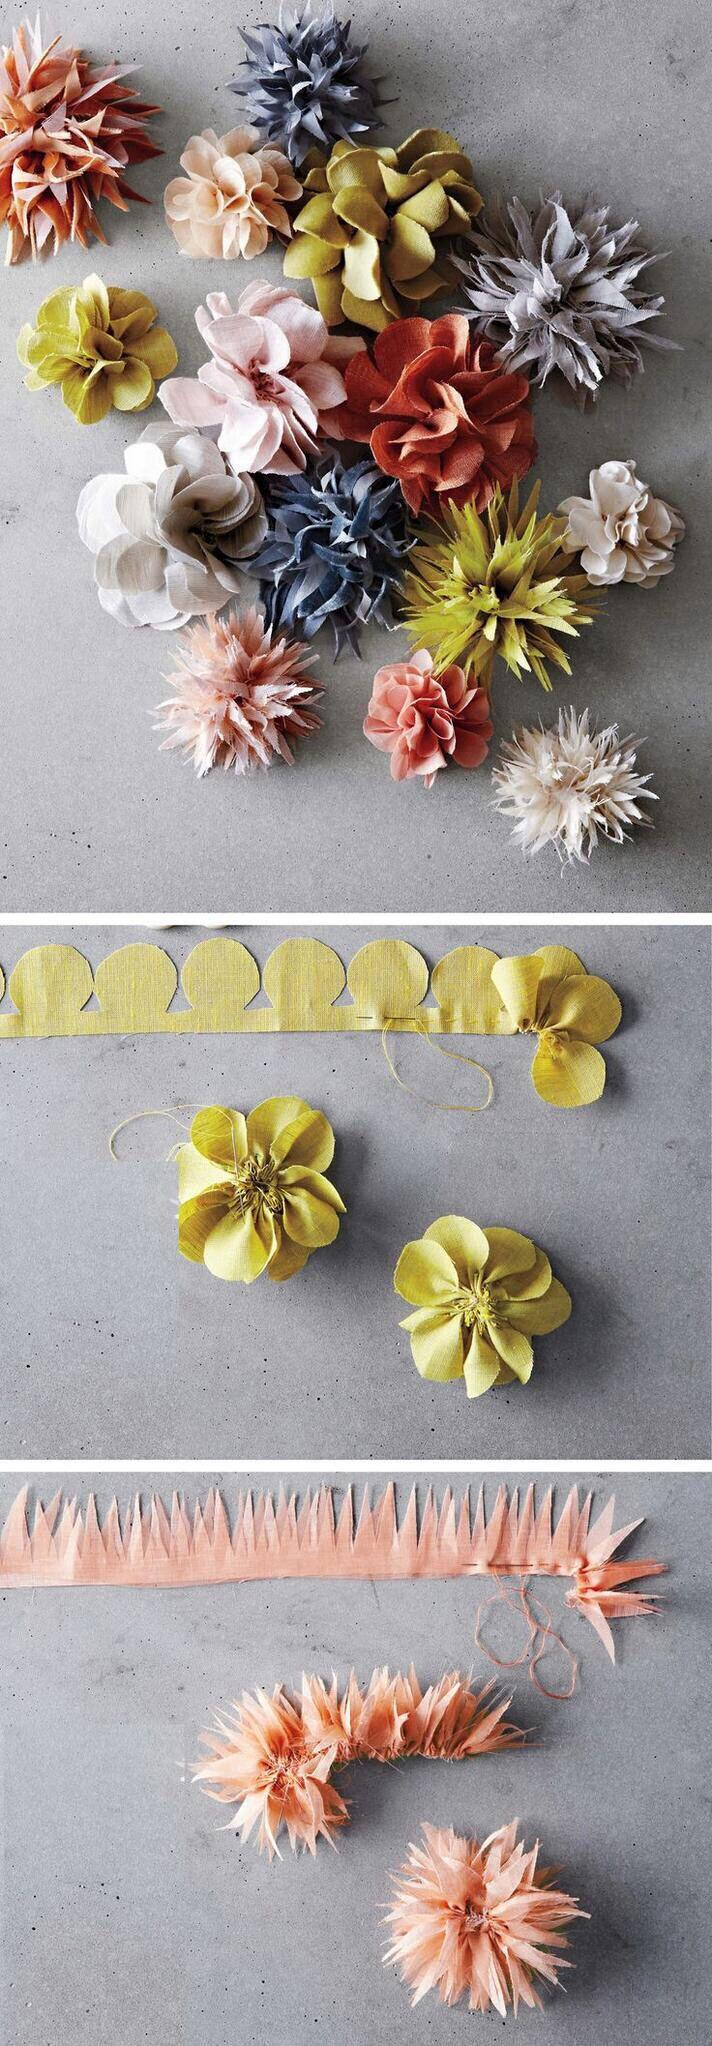 Paper flower tutorial for Diy paper crafts tutorials